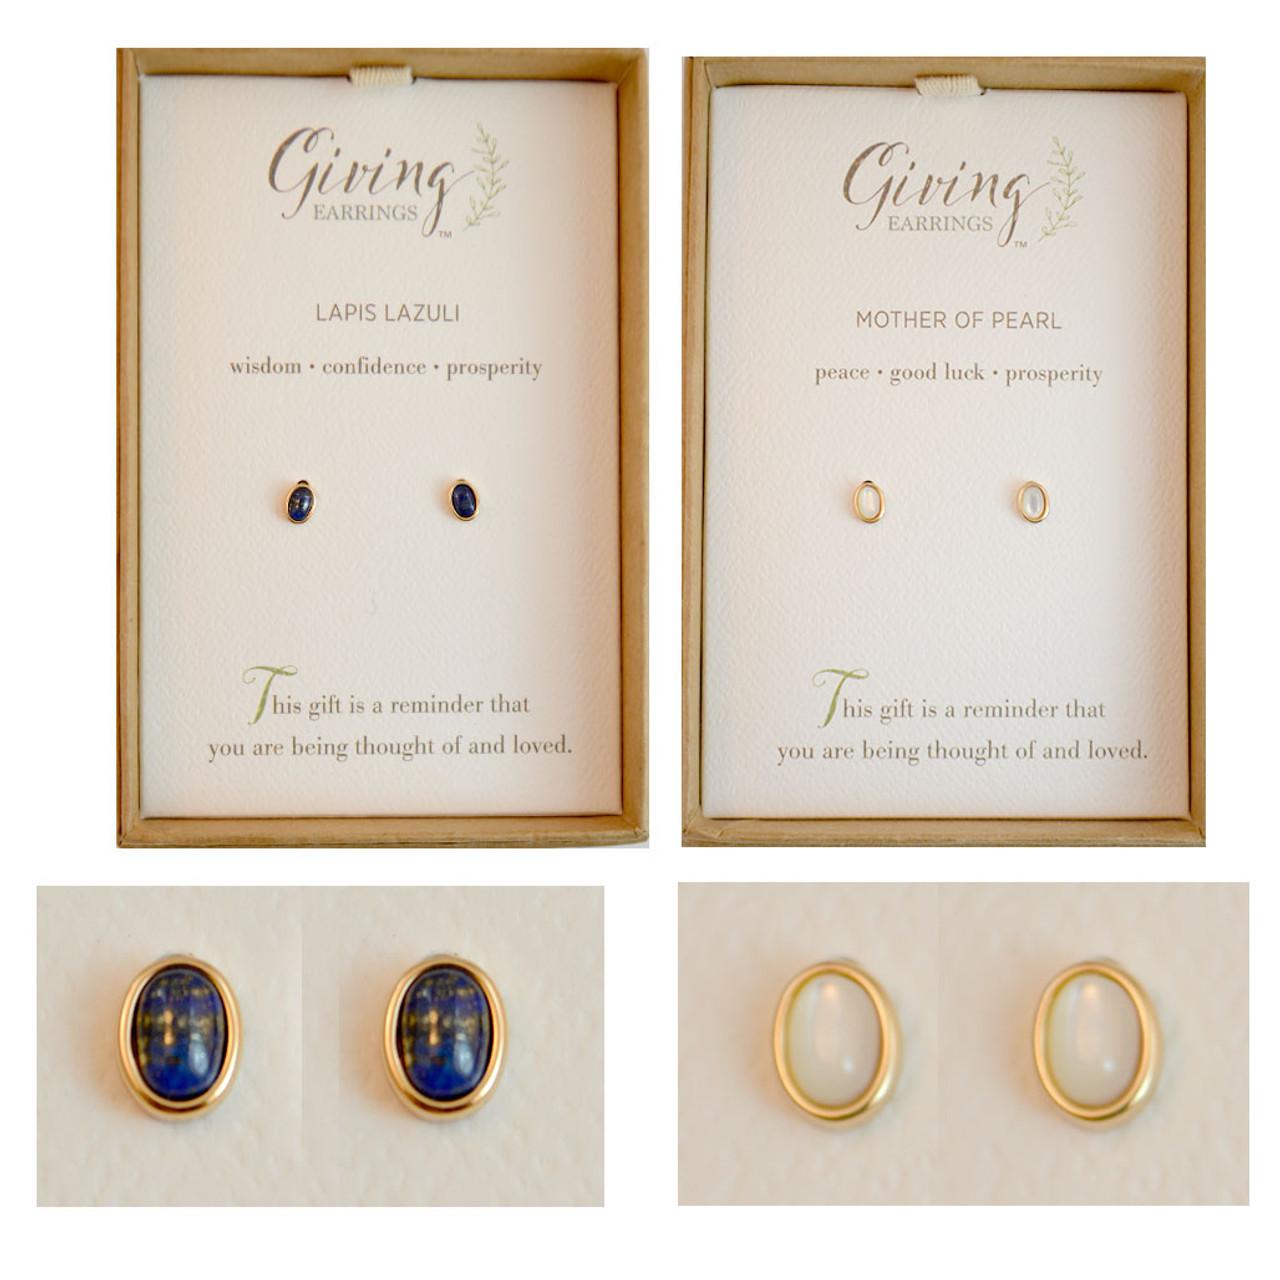 Giving Earrings - Sold Separately